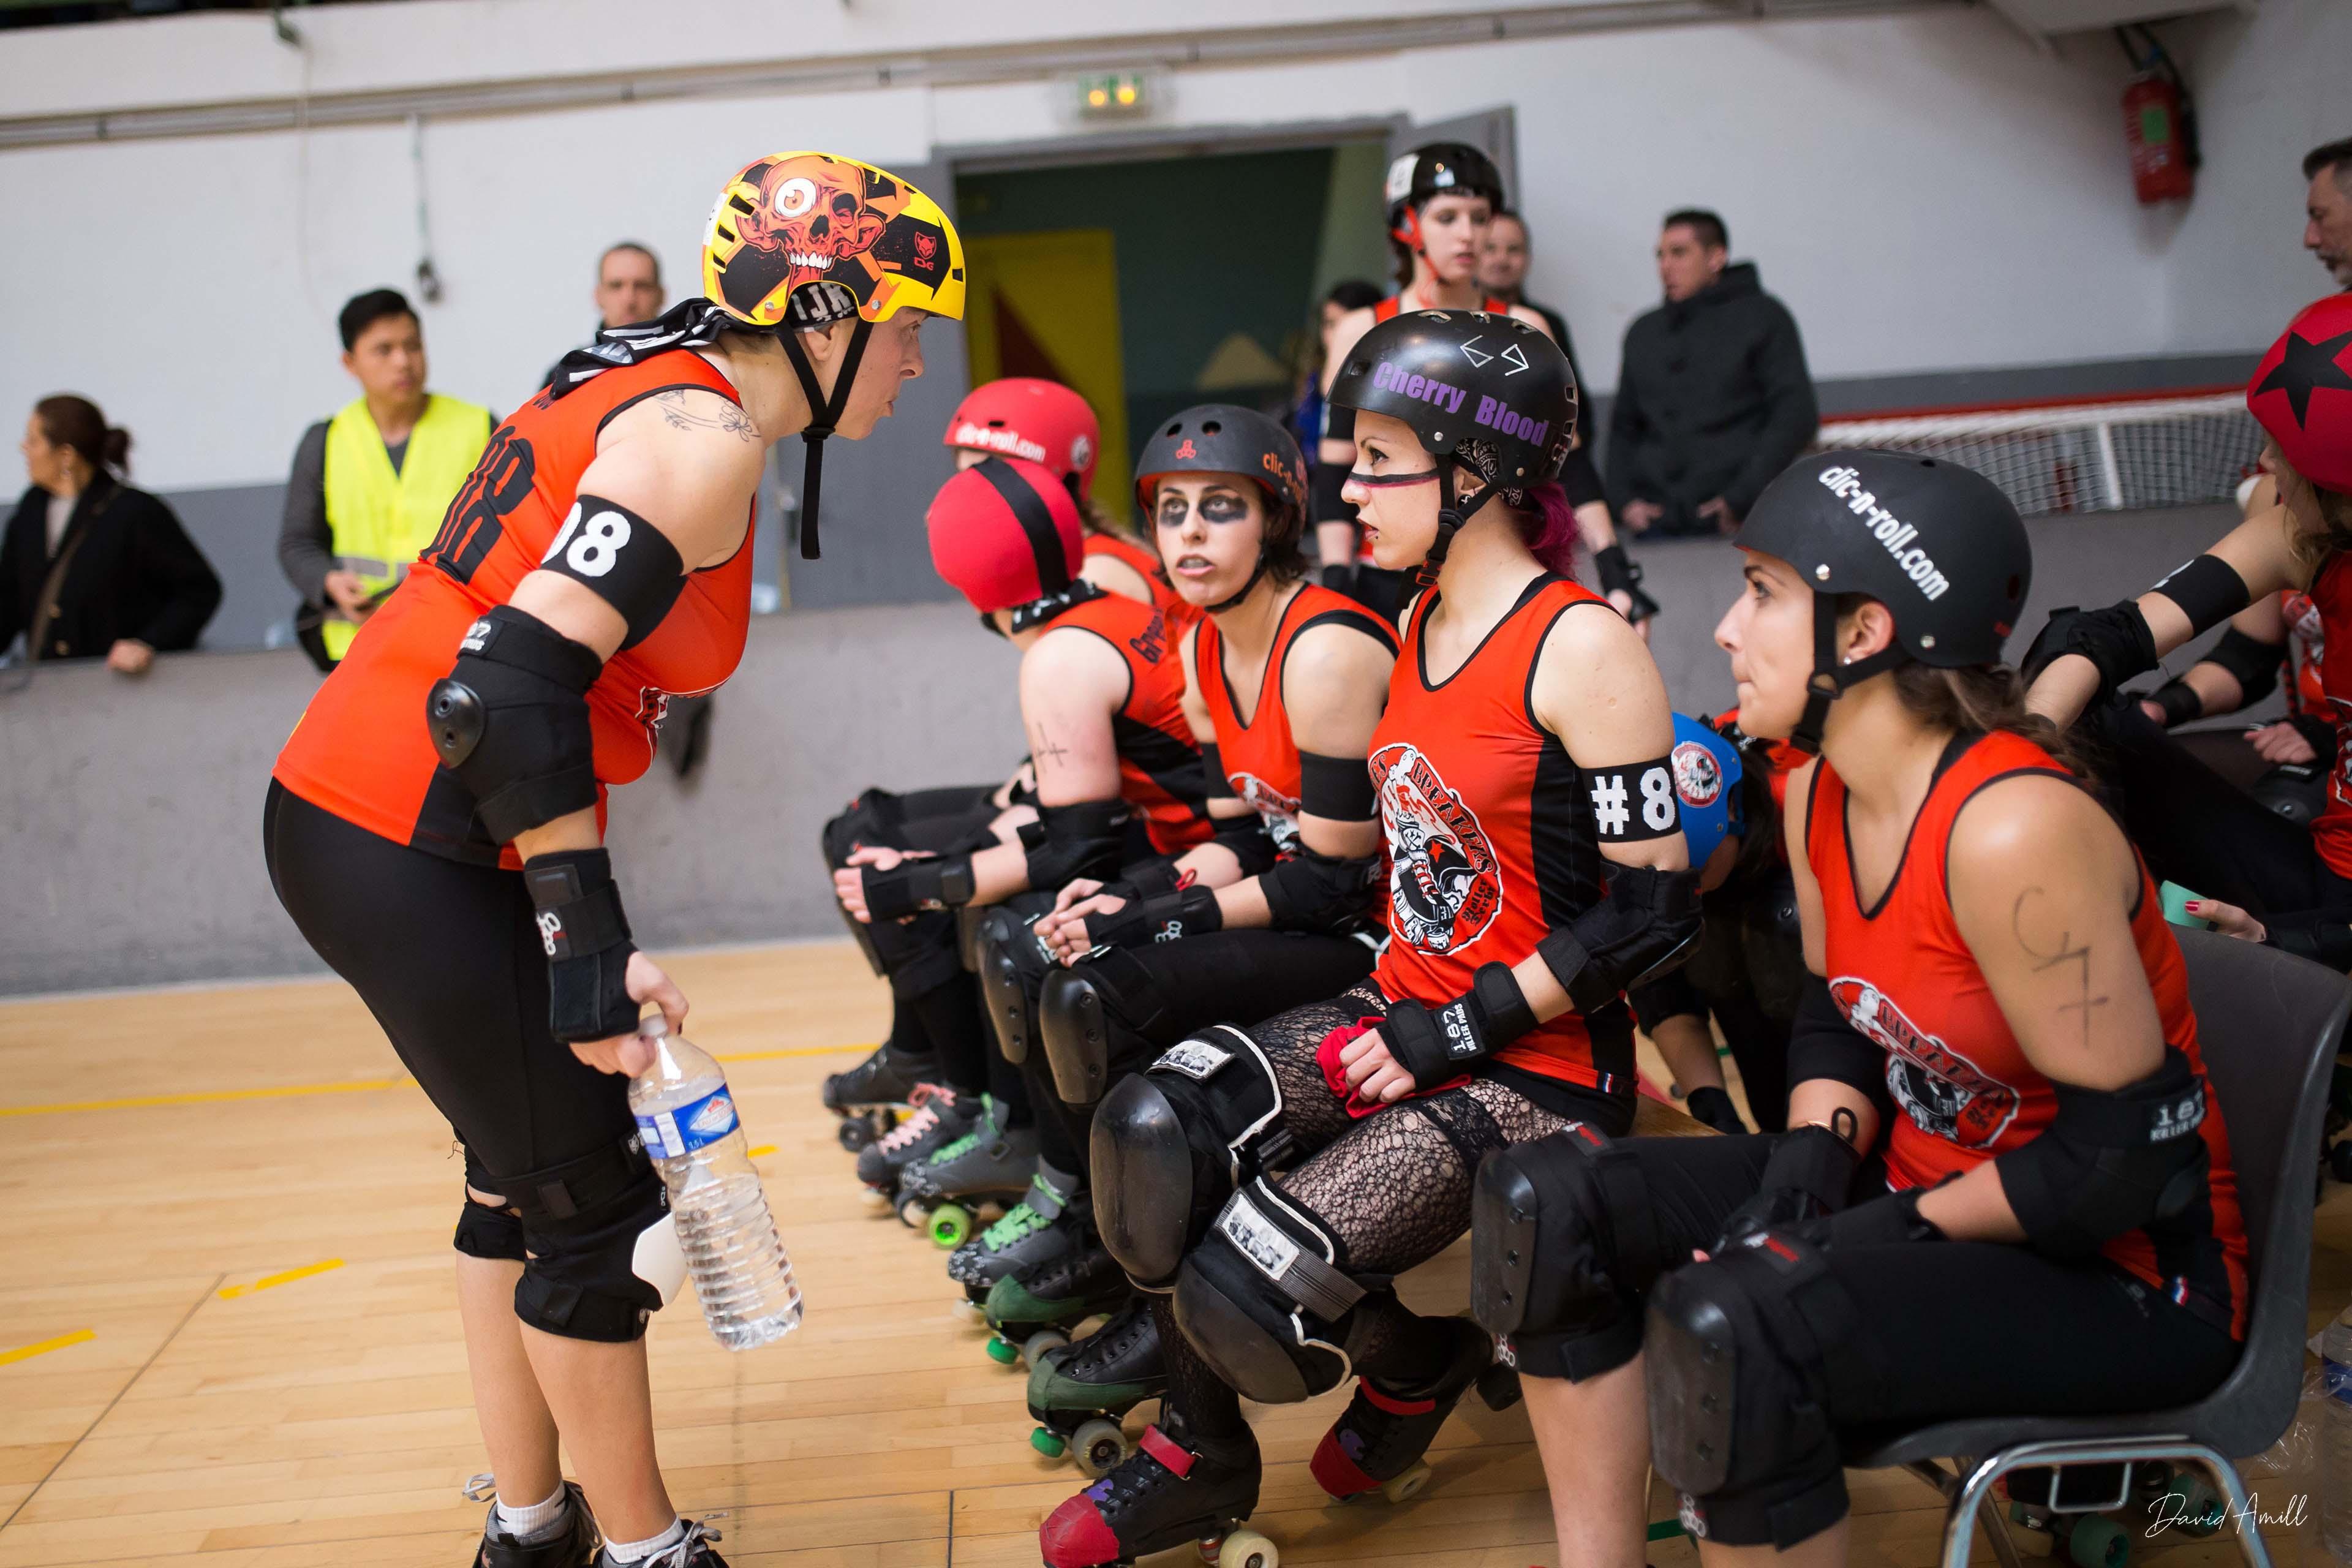 Roller Derby Match Bones Breaker Nimes Broyeuses de chair alès